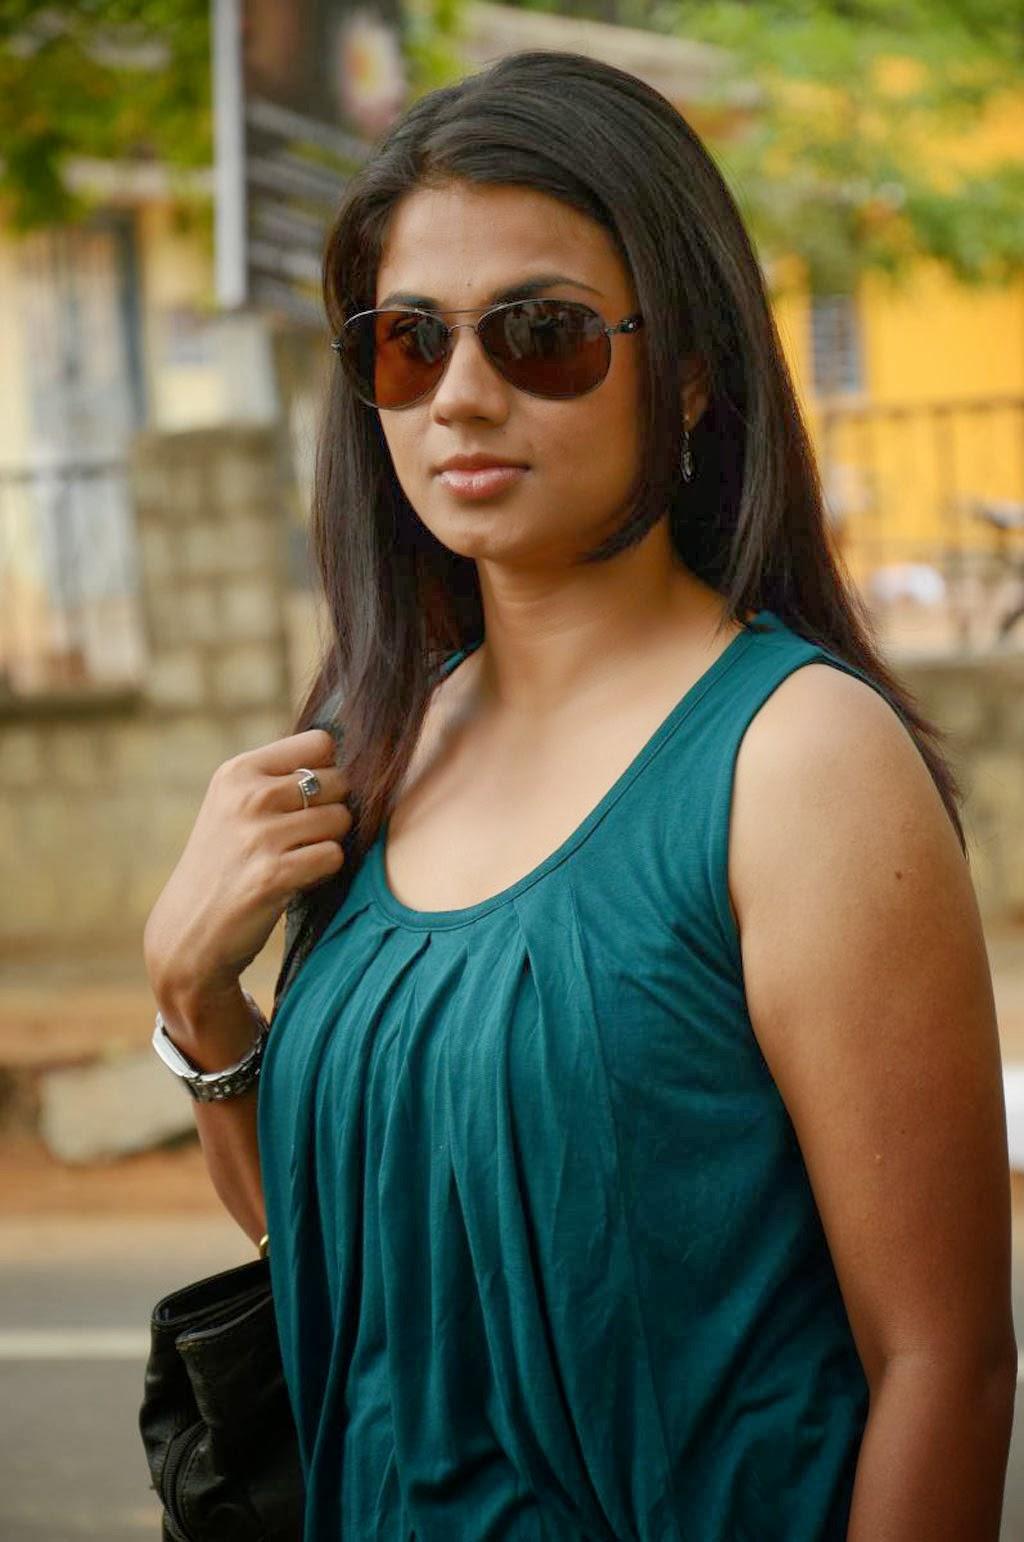 Hot Udhasha photo gallery in sandhithathum sindhithathum tamil movie